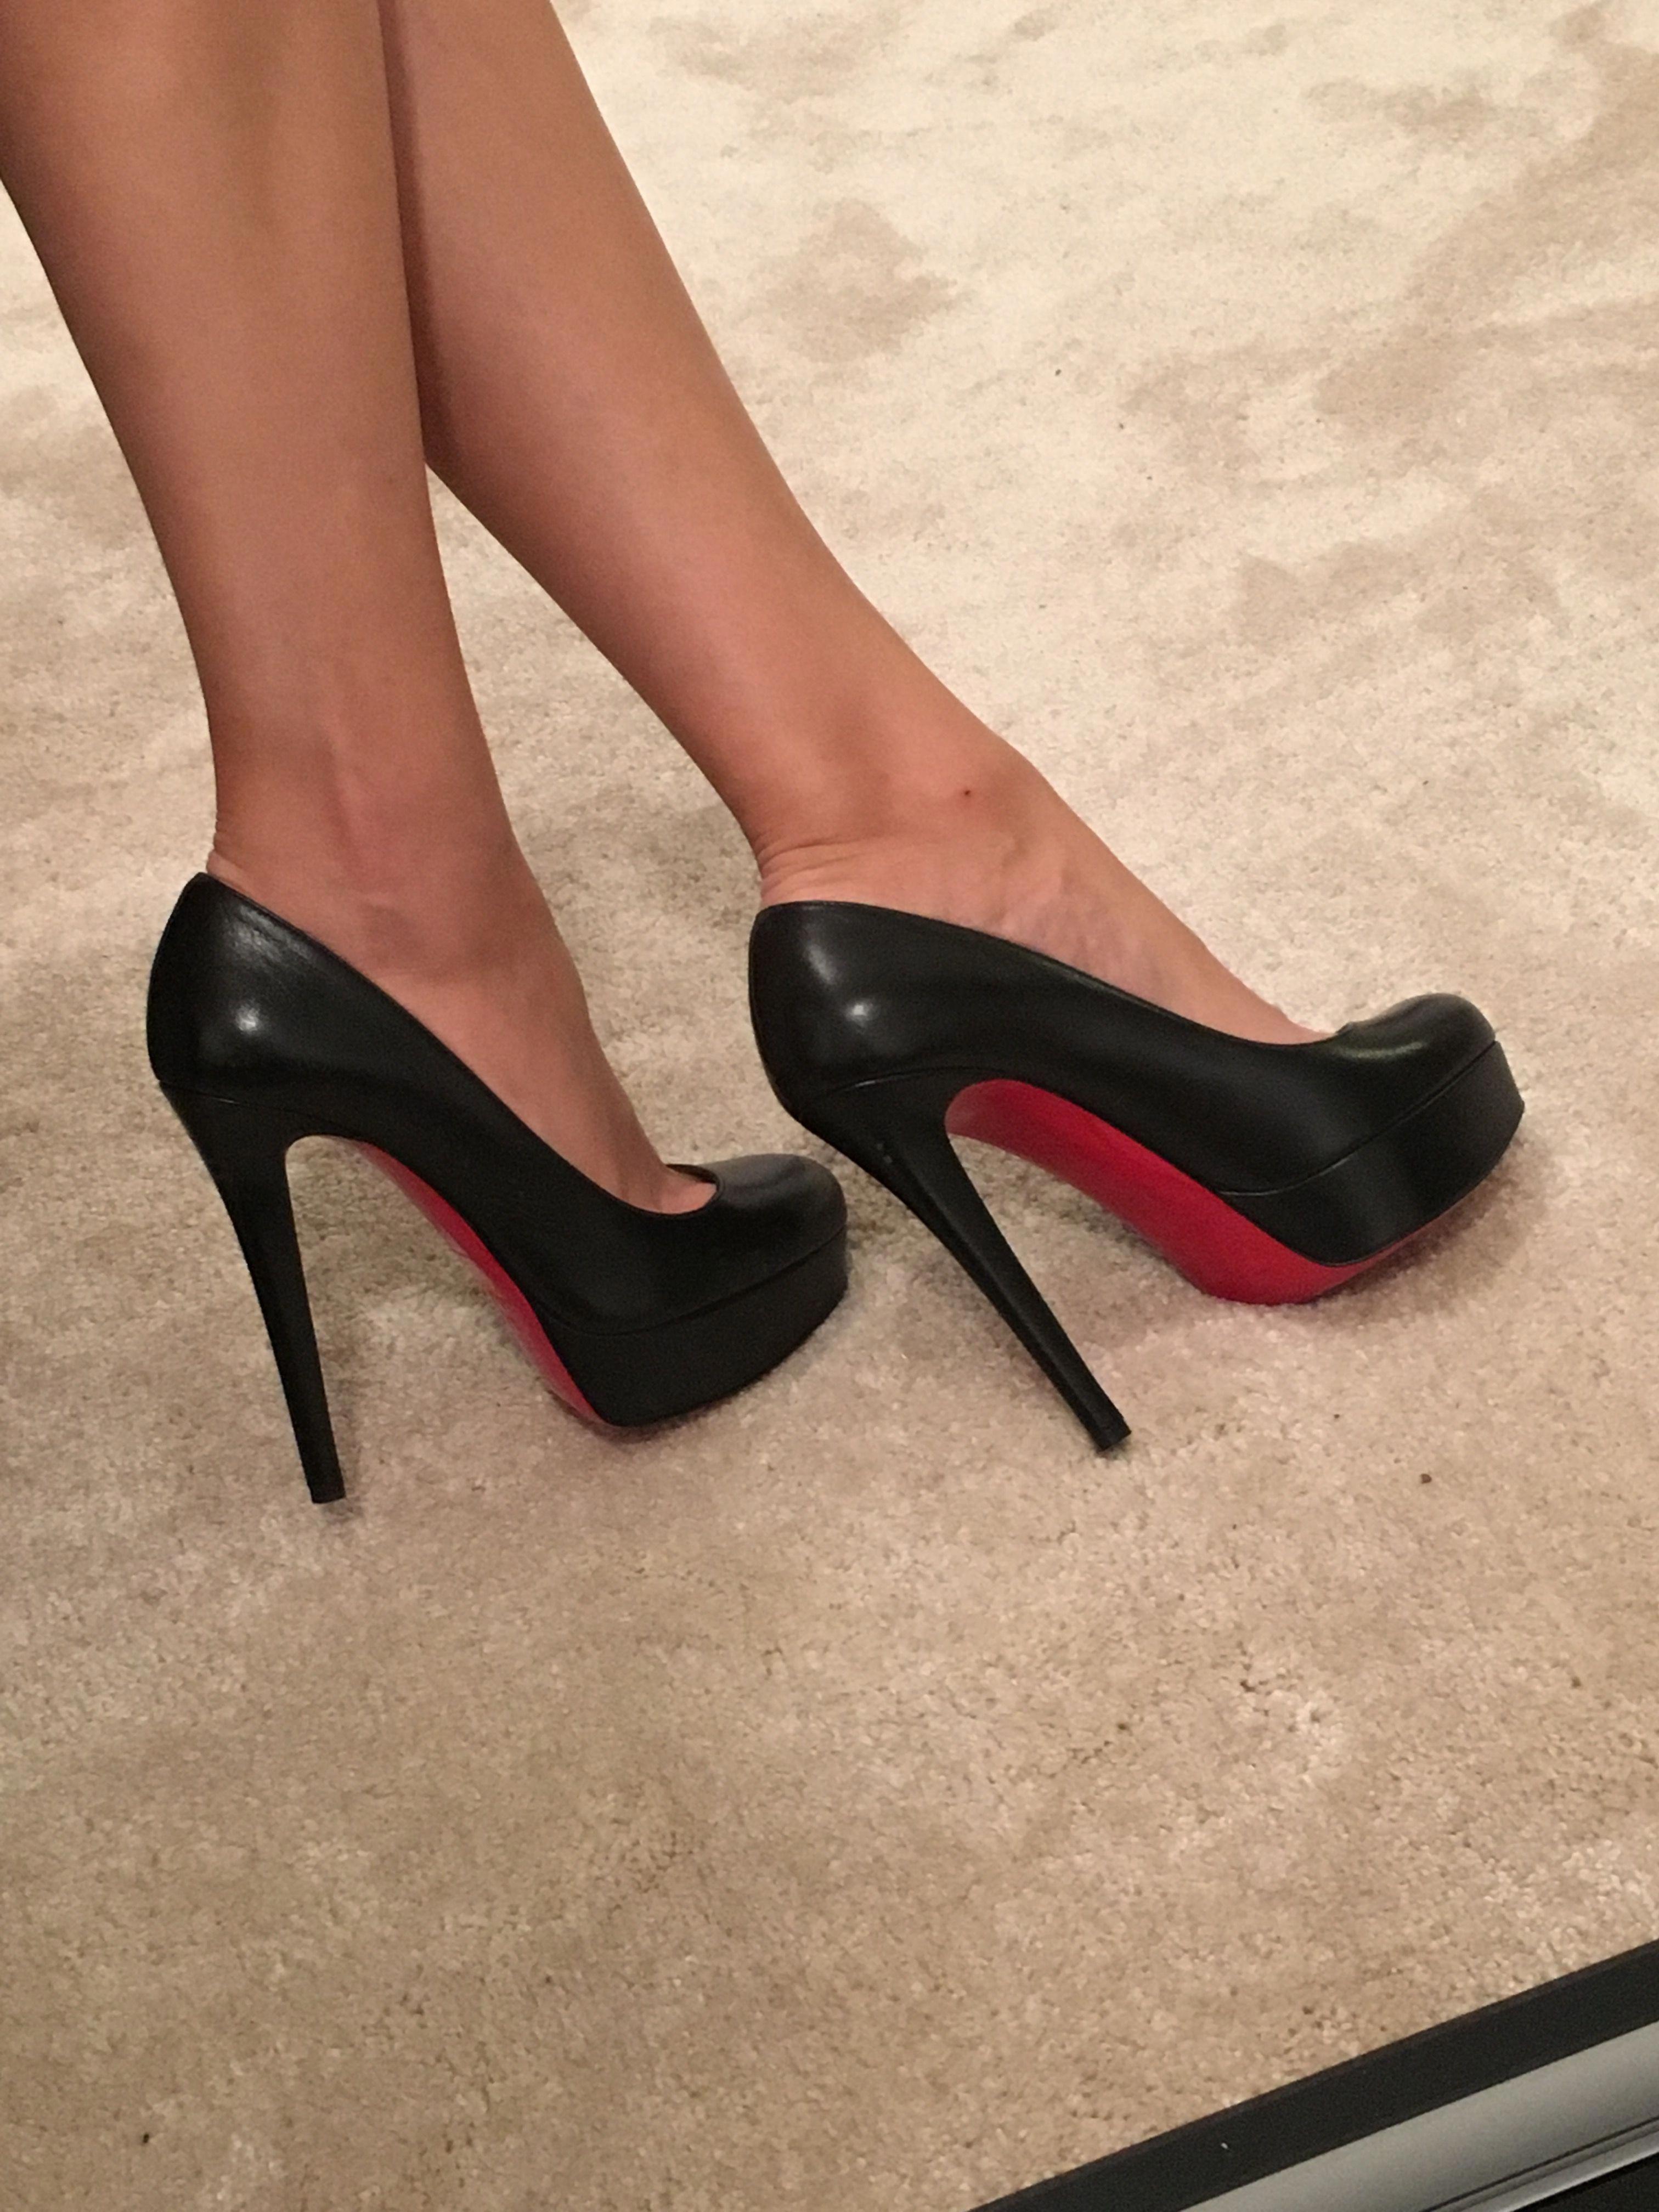 shiny black high heel pumps